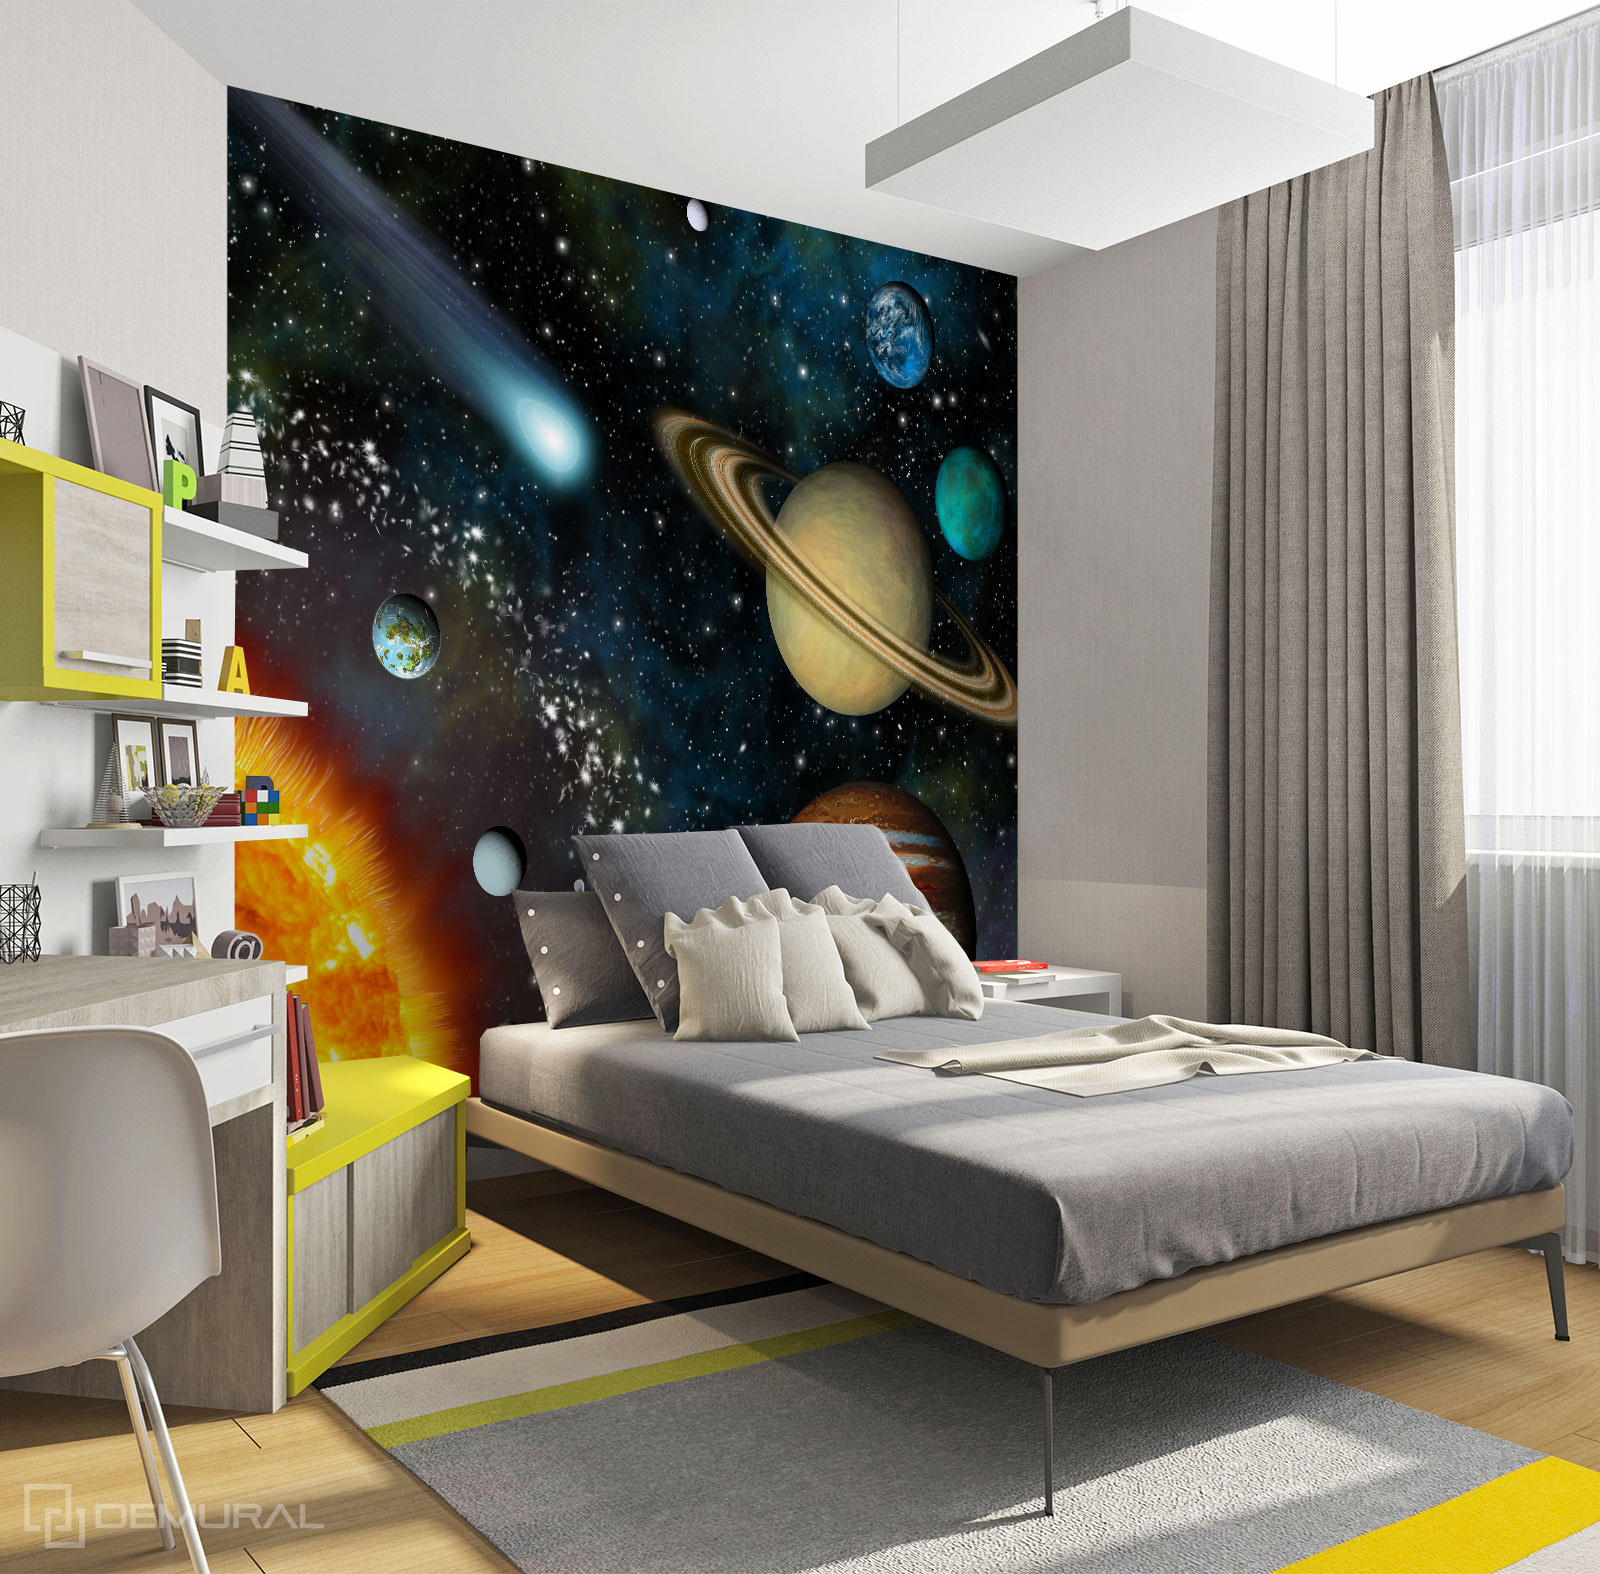 Photo wallpaper Cosmic view - Photo wallpaper cosmos - Demural